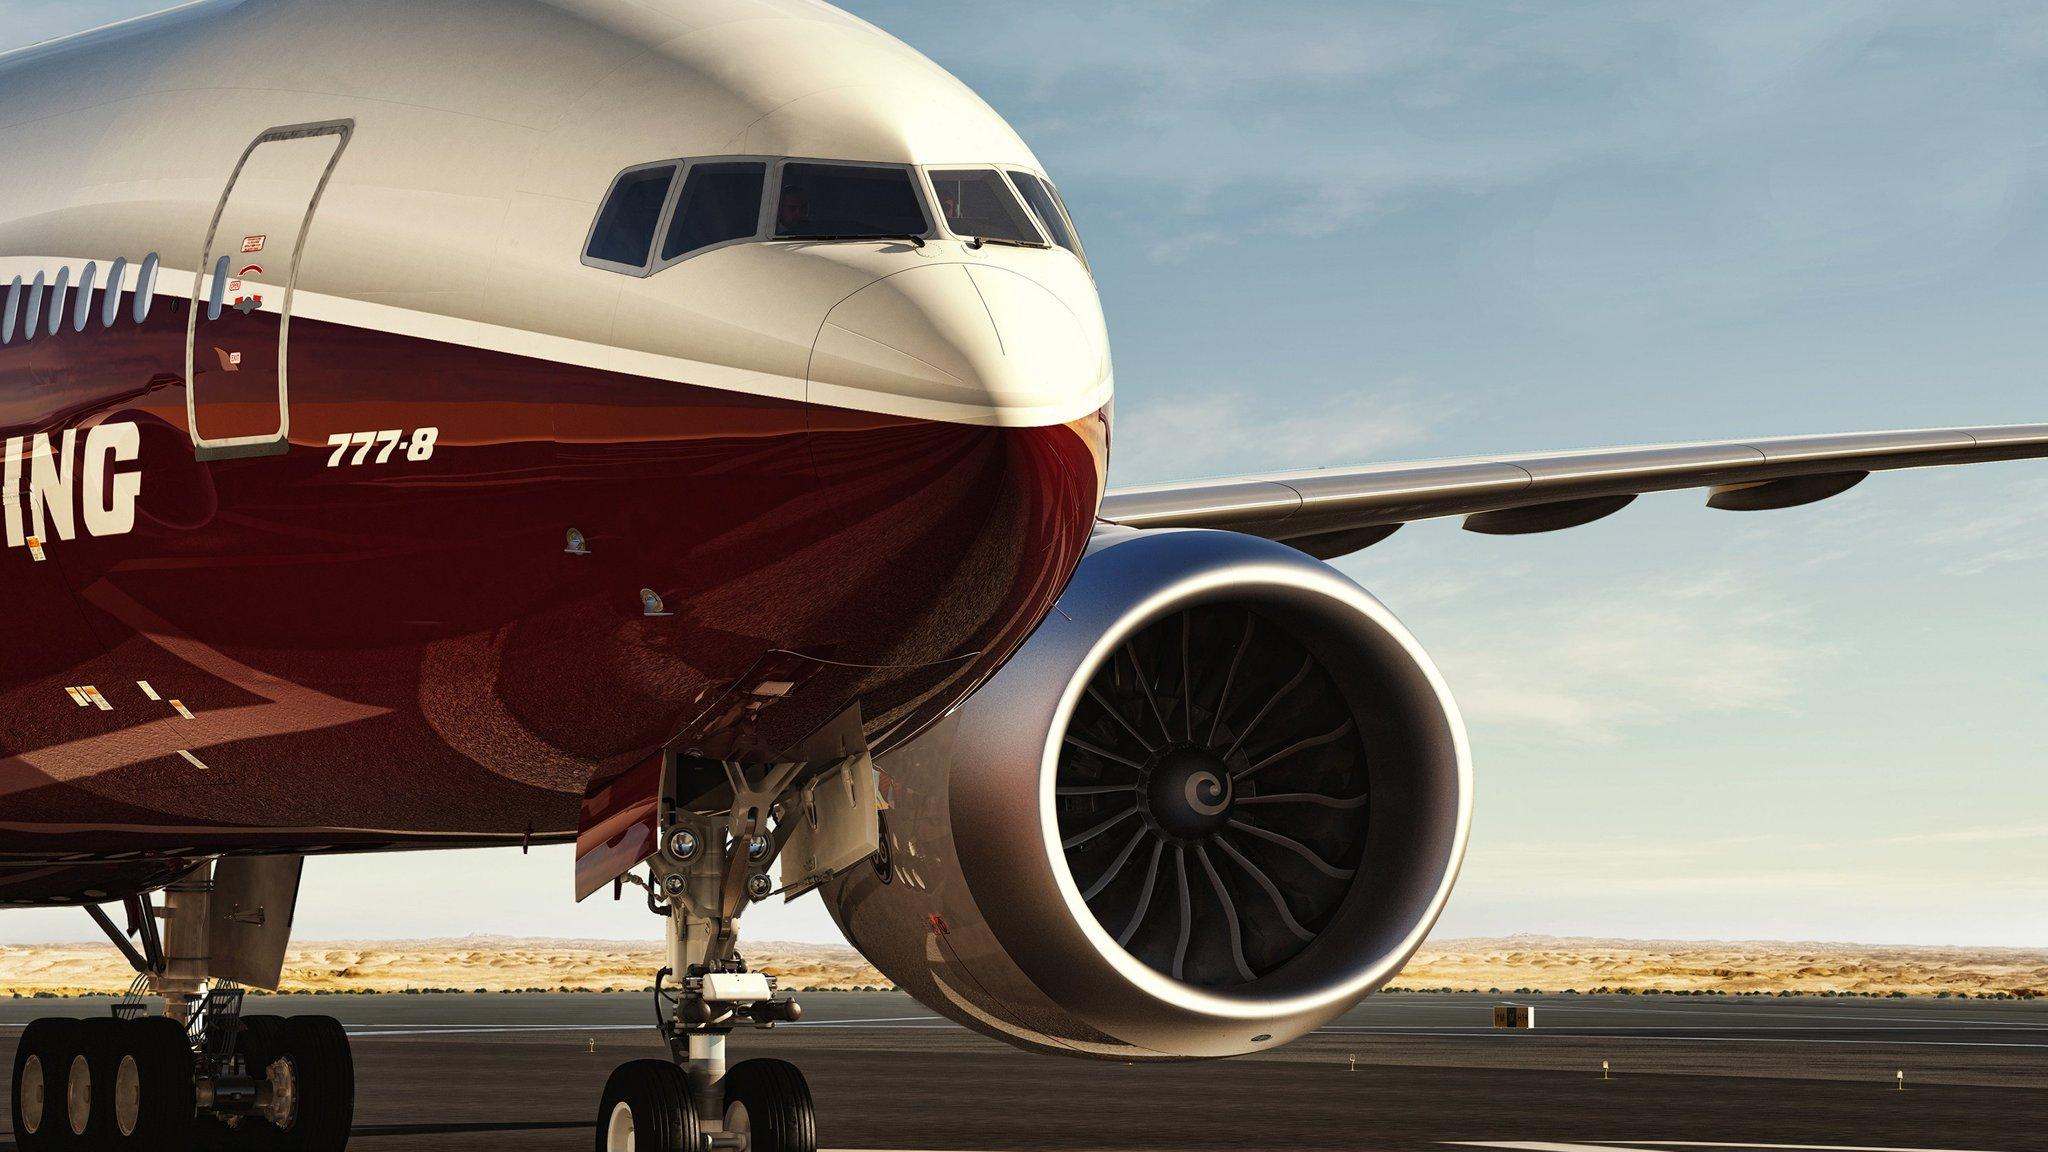 A new era of 'ultra-long-haul' aviation   Financial Times